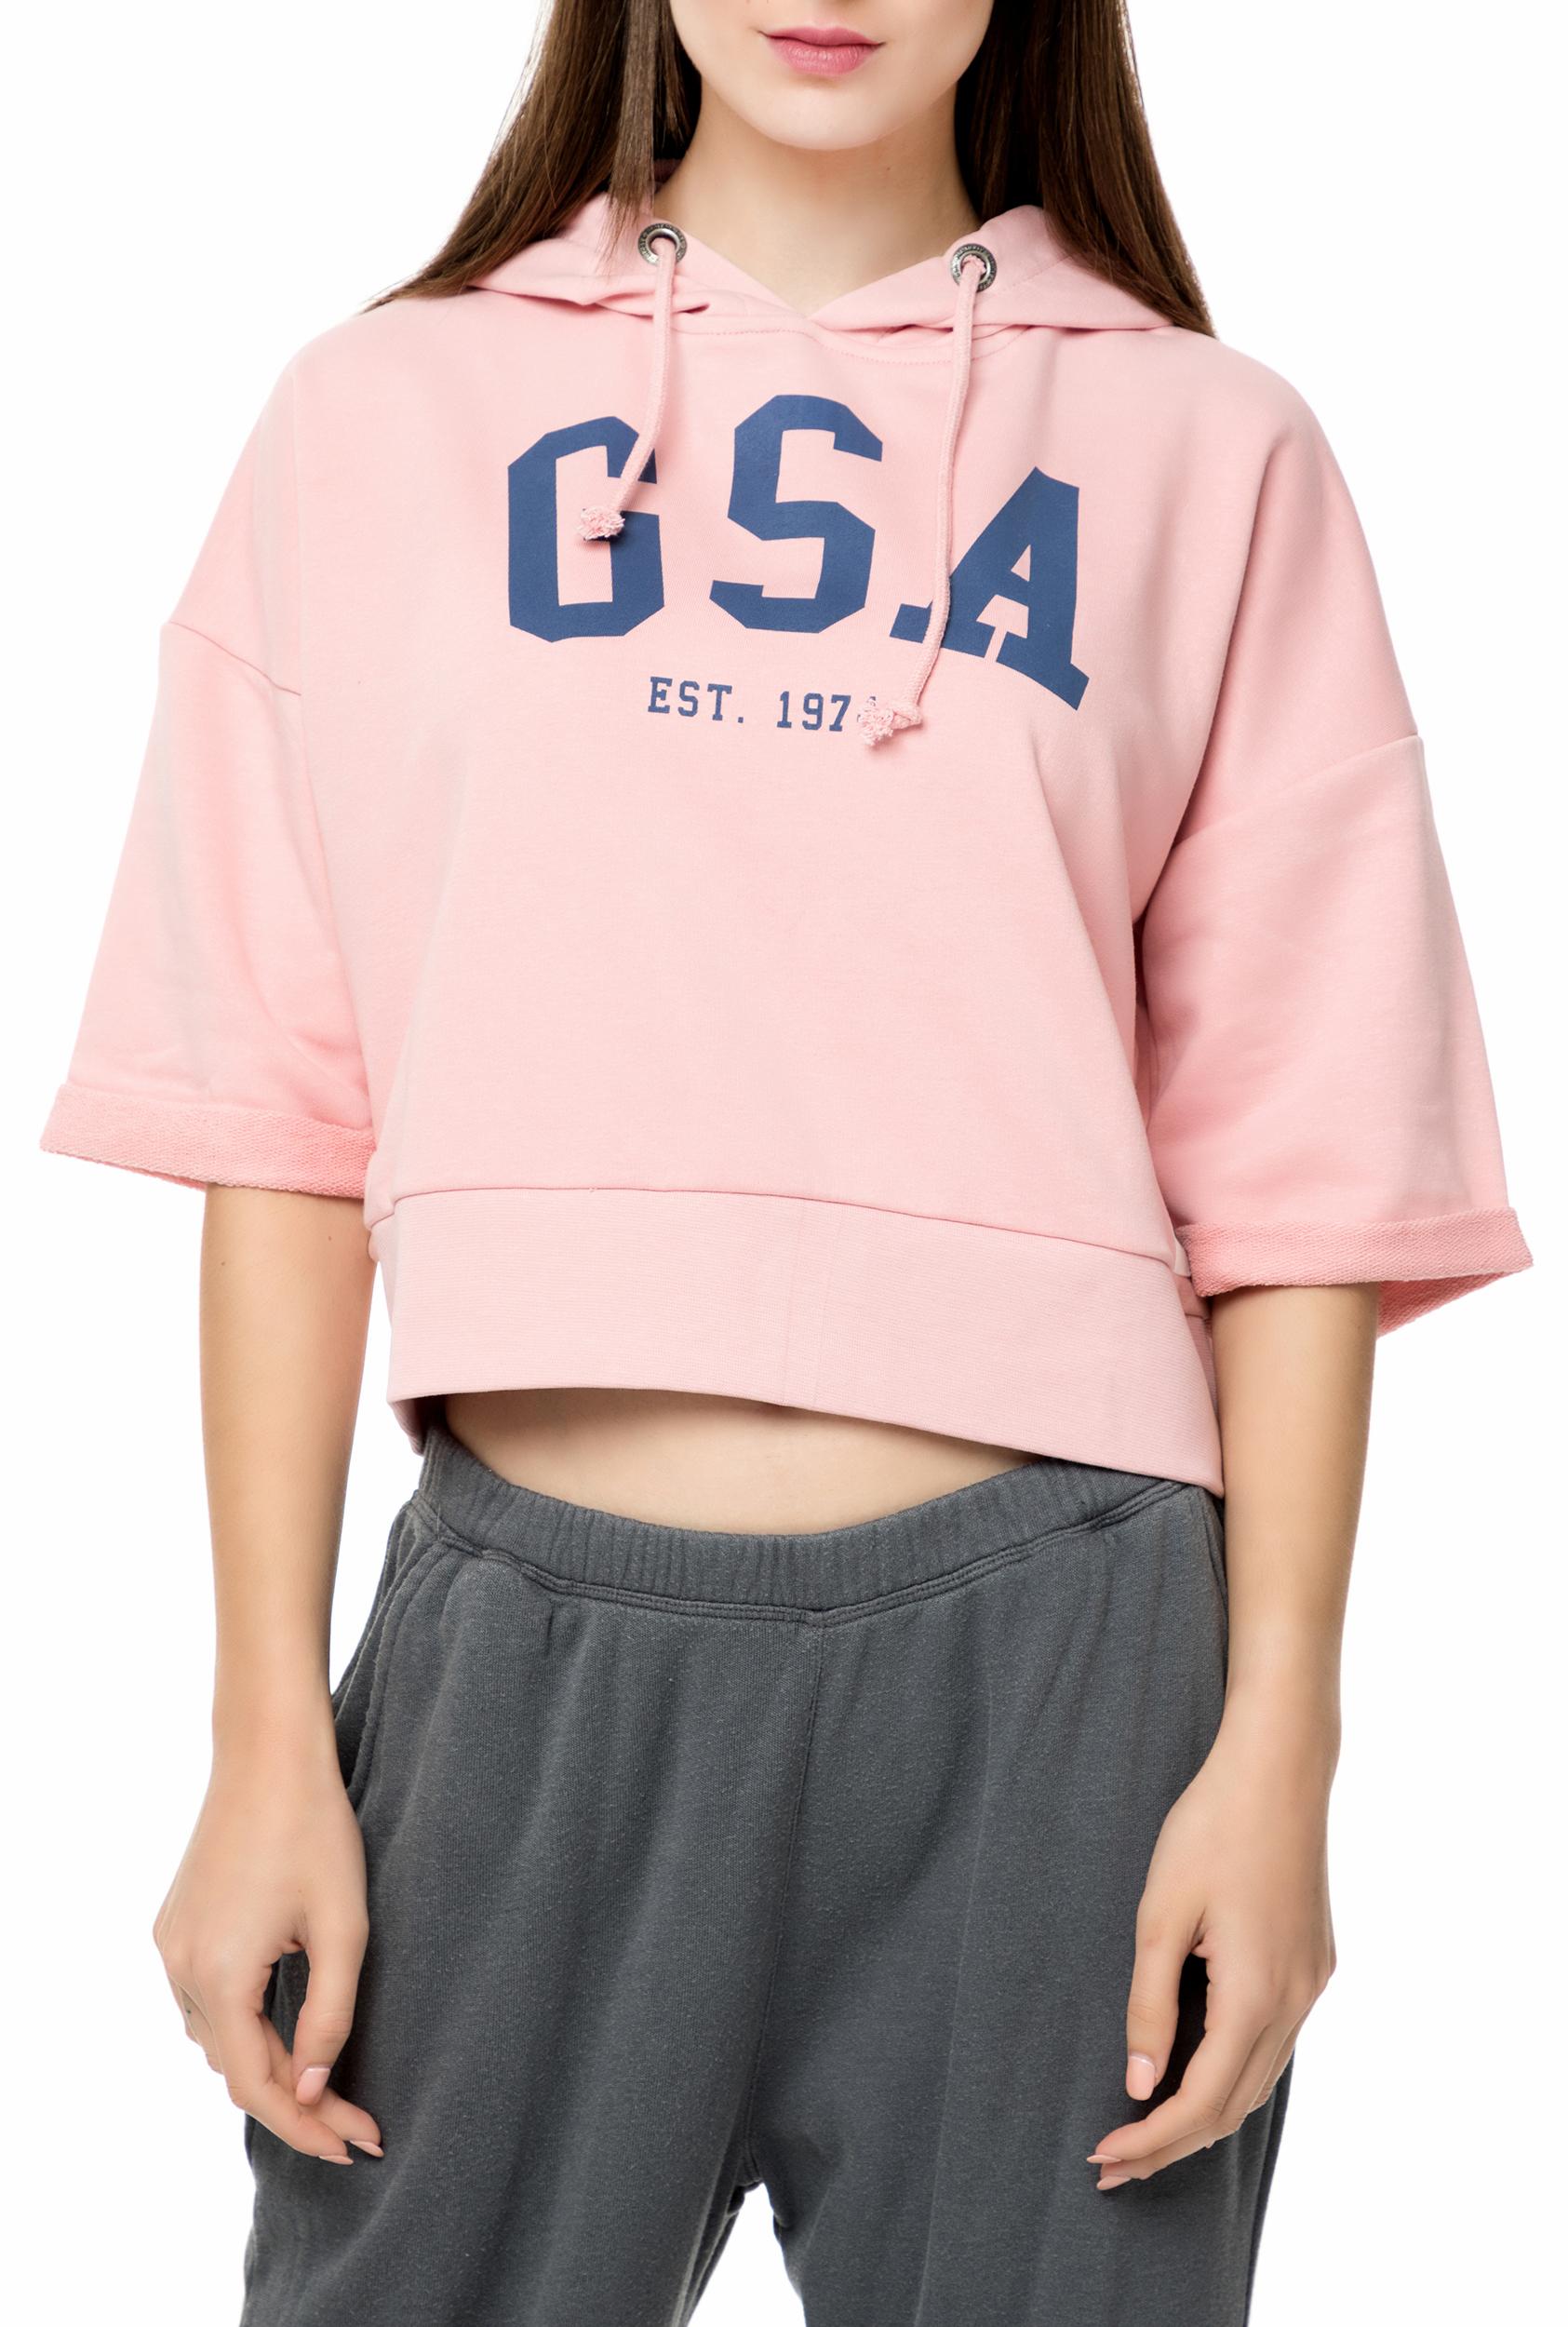 28f126531063 GSA - Γυναικεία φούτερ μπλούζα GSA GLORY CROPPED HOODIE ροζ